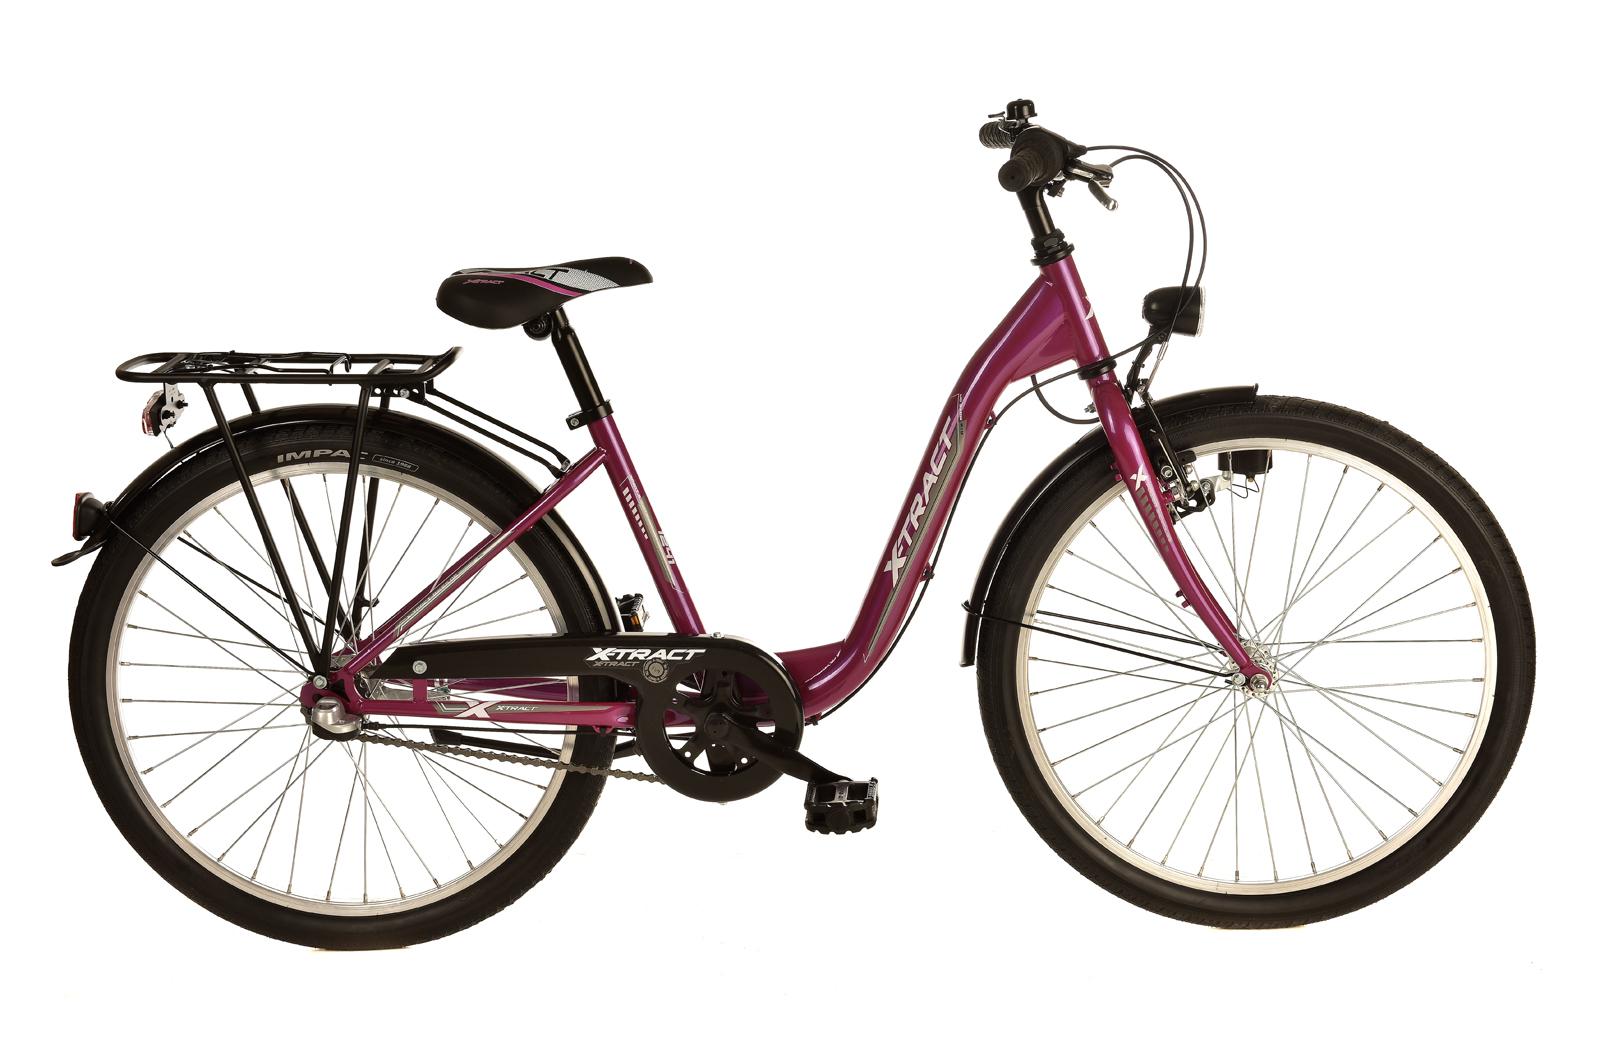 X Tract 1241 Feldmeier Bikes